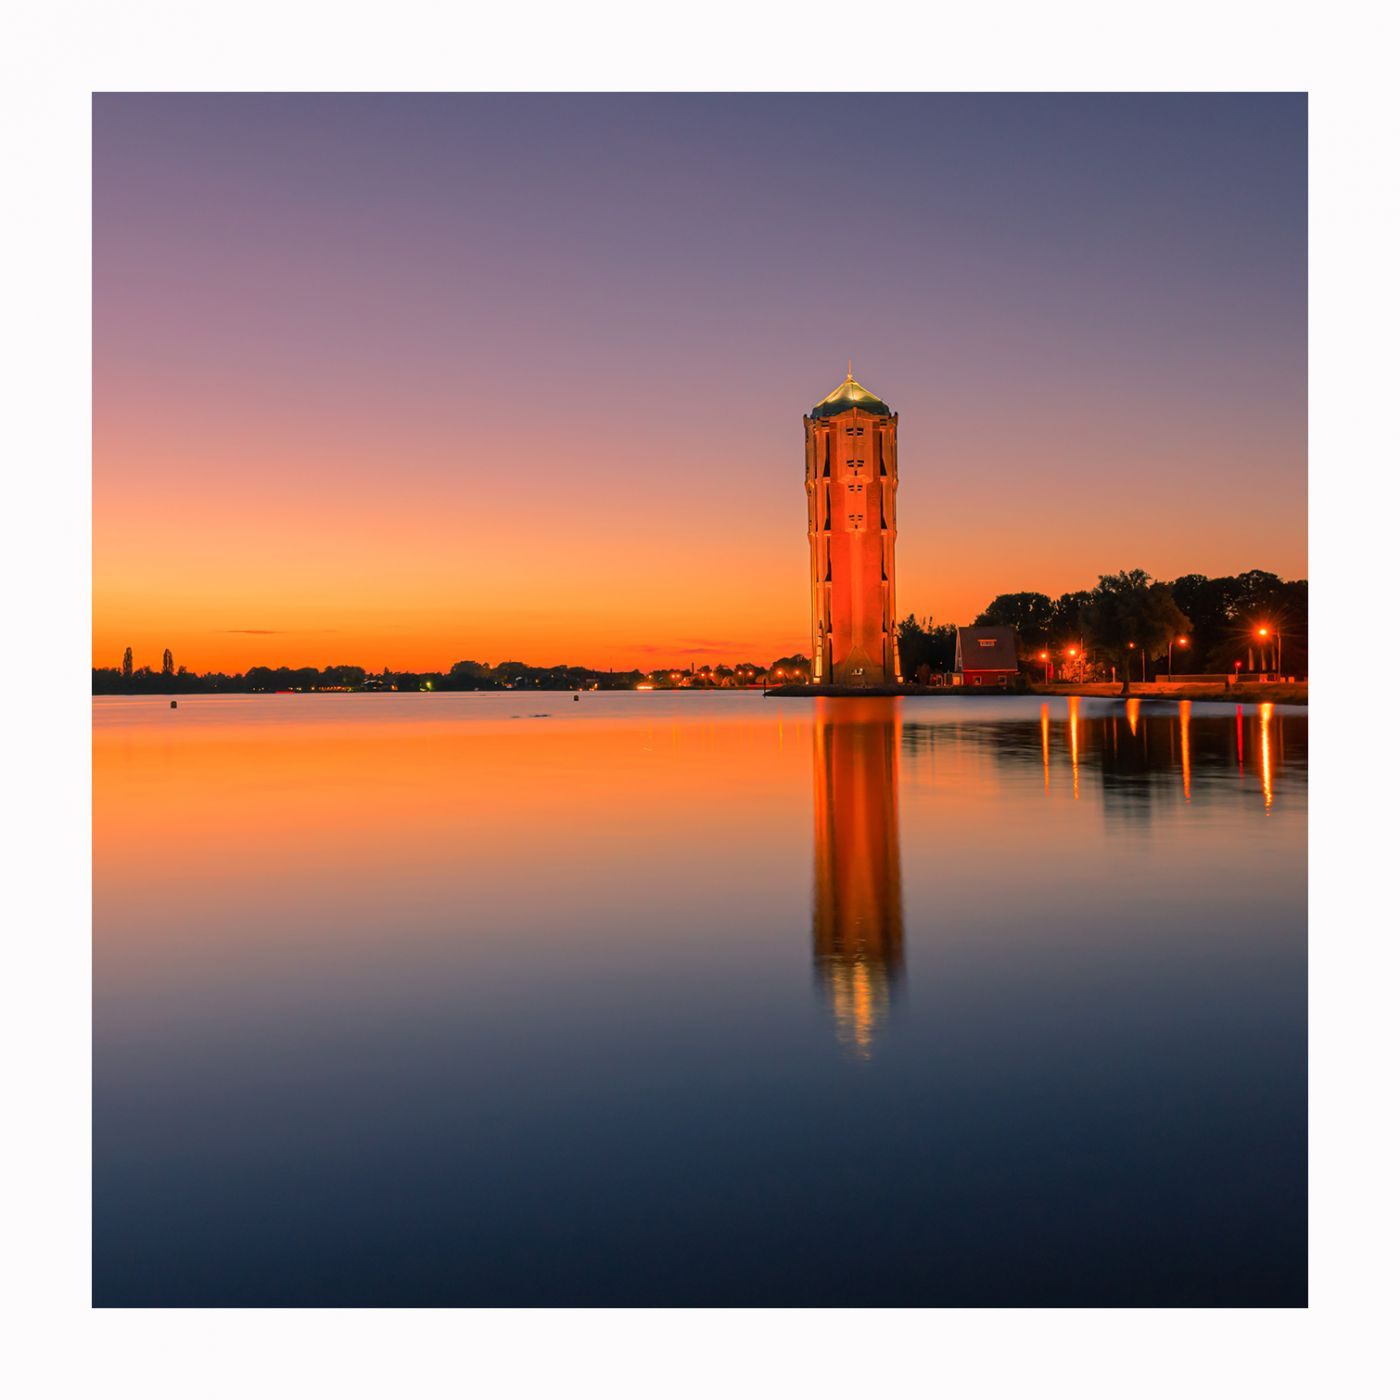 Alsmeer Watertower after sunset, Netherlands